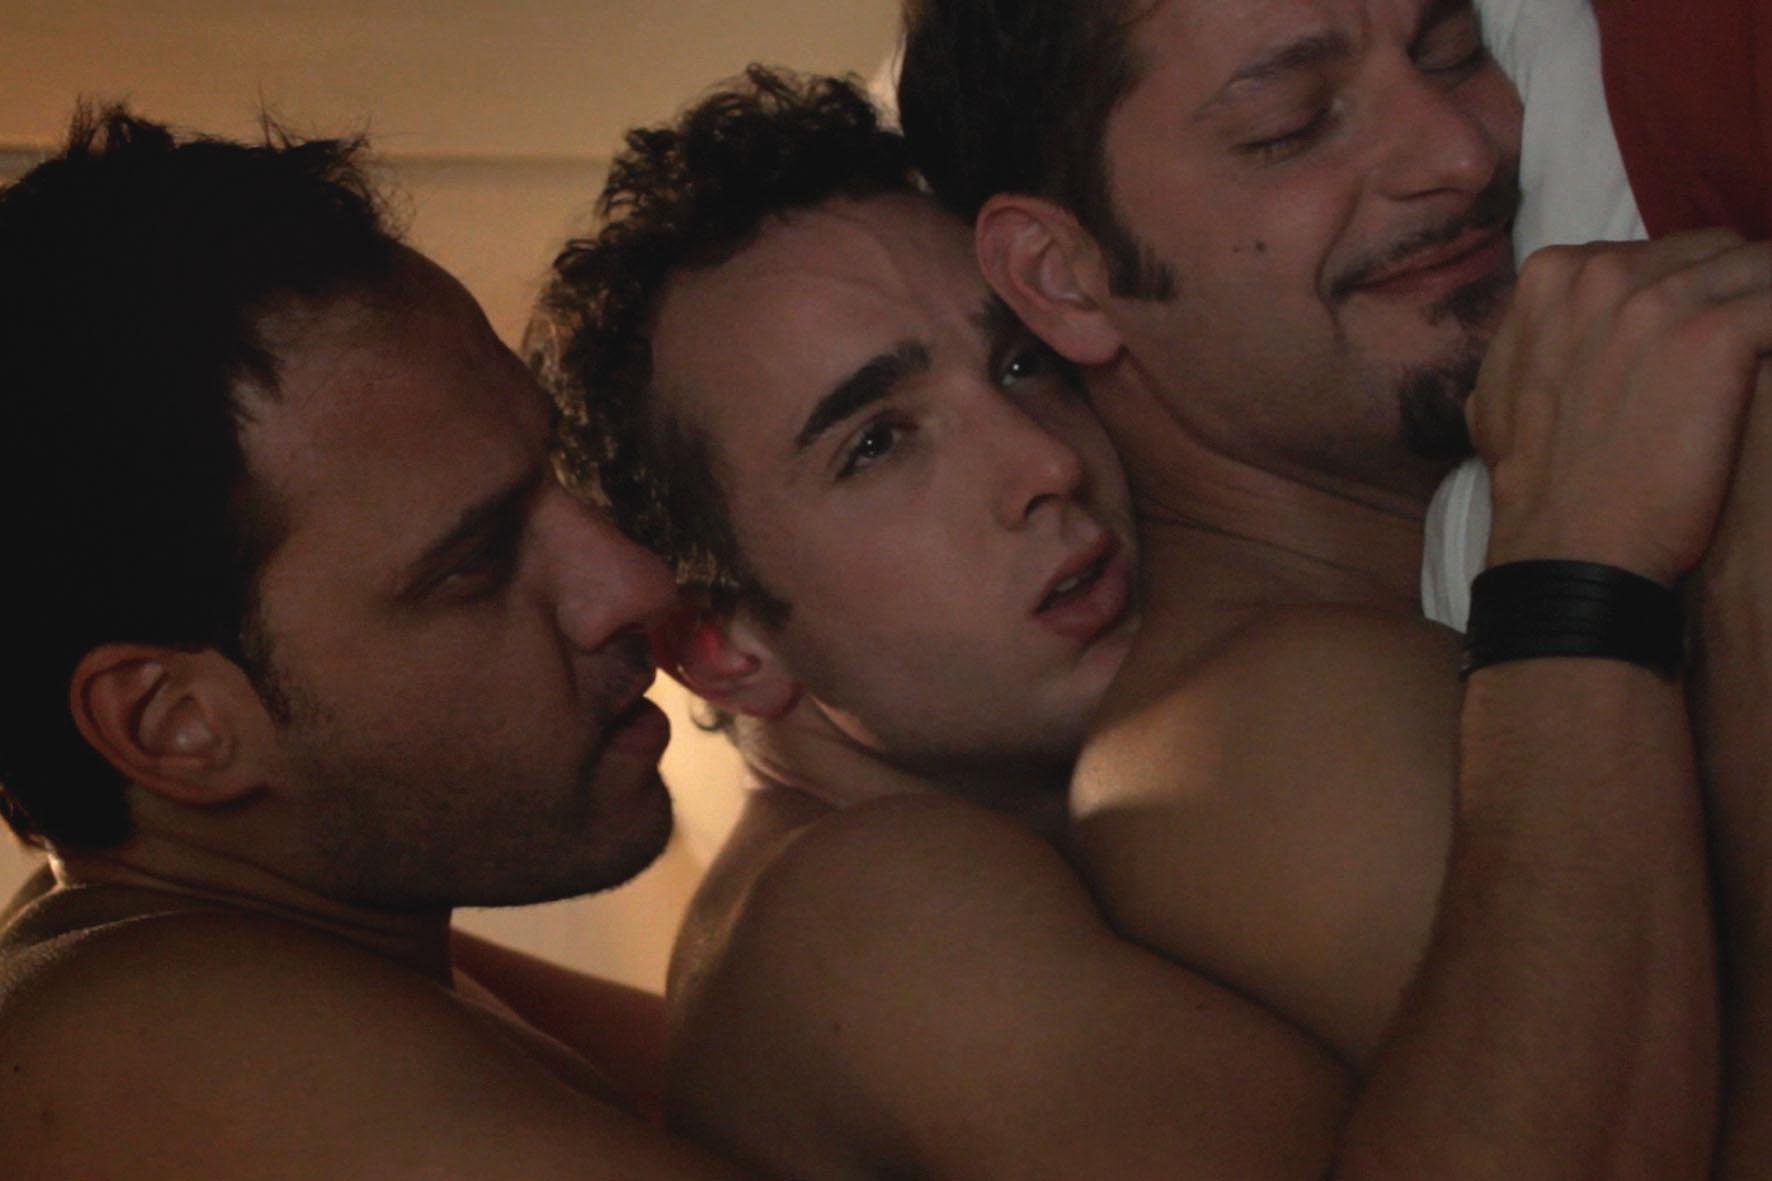 gay best sex gratis porno modne herrer